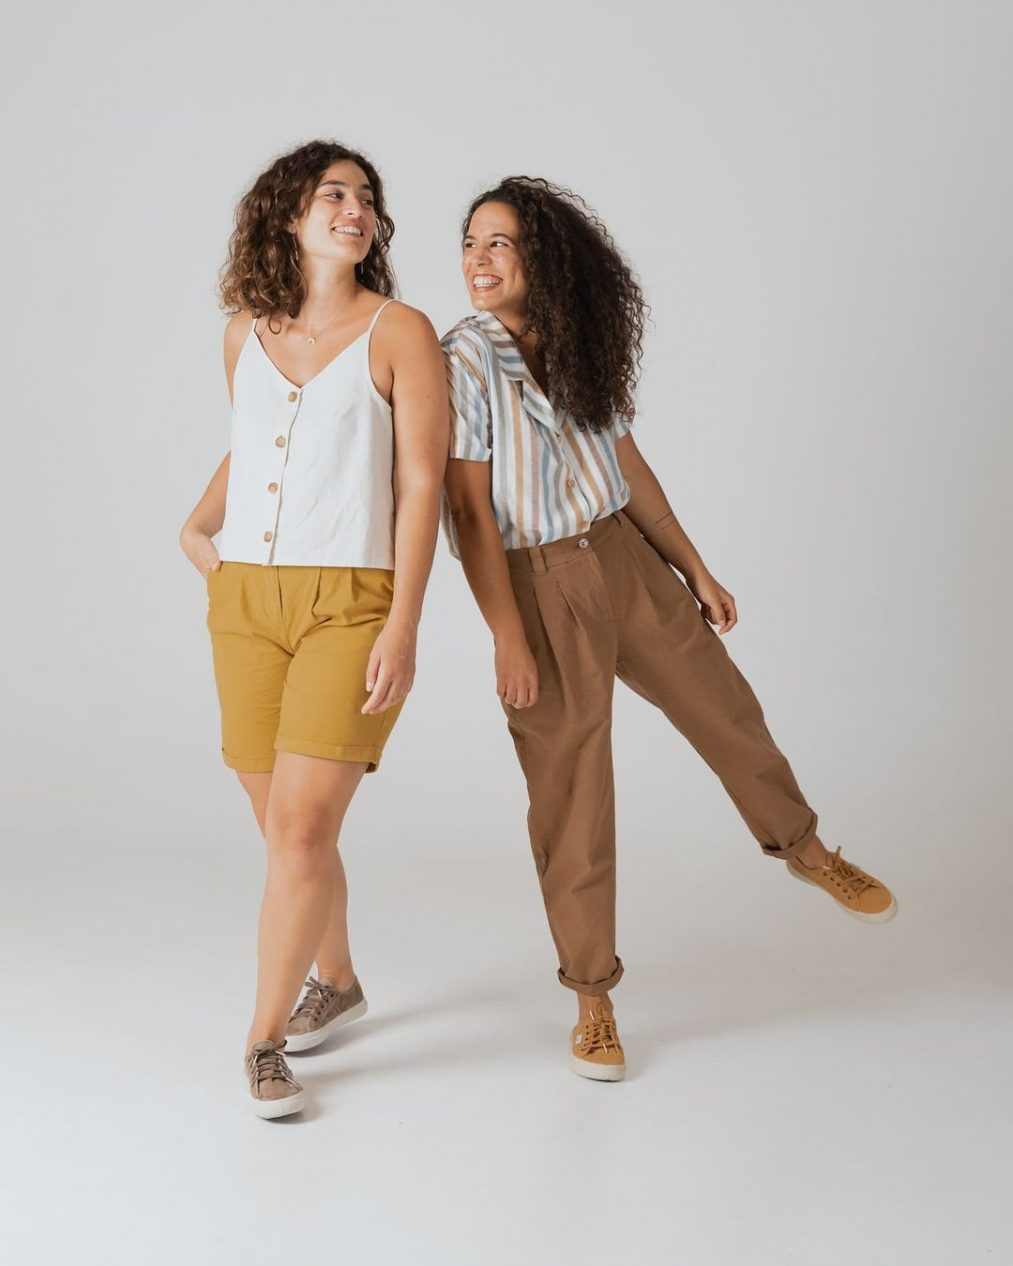 Duas raparigas animadas lado a lado sob fundo branco